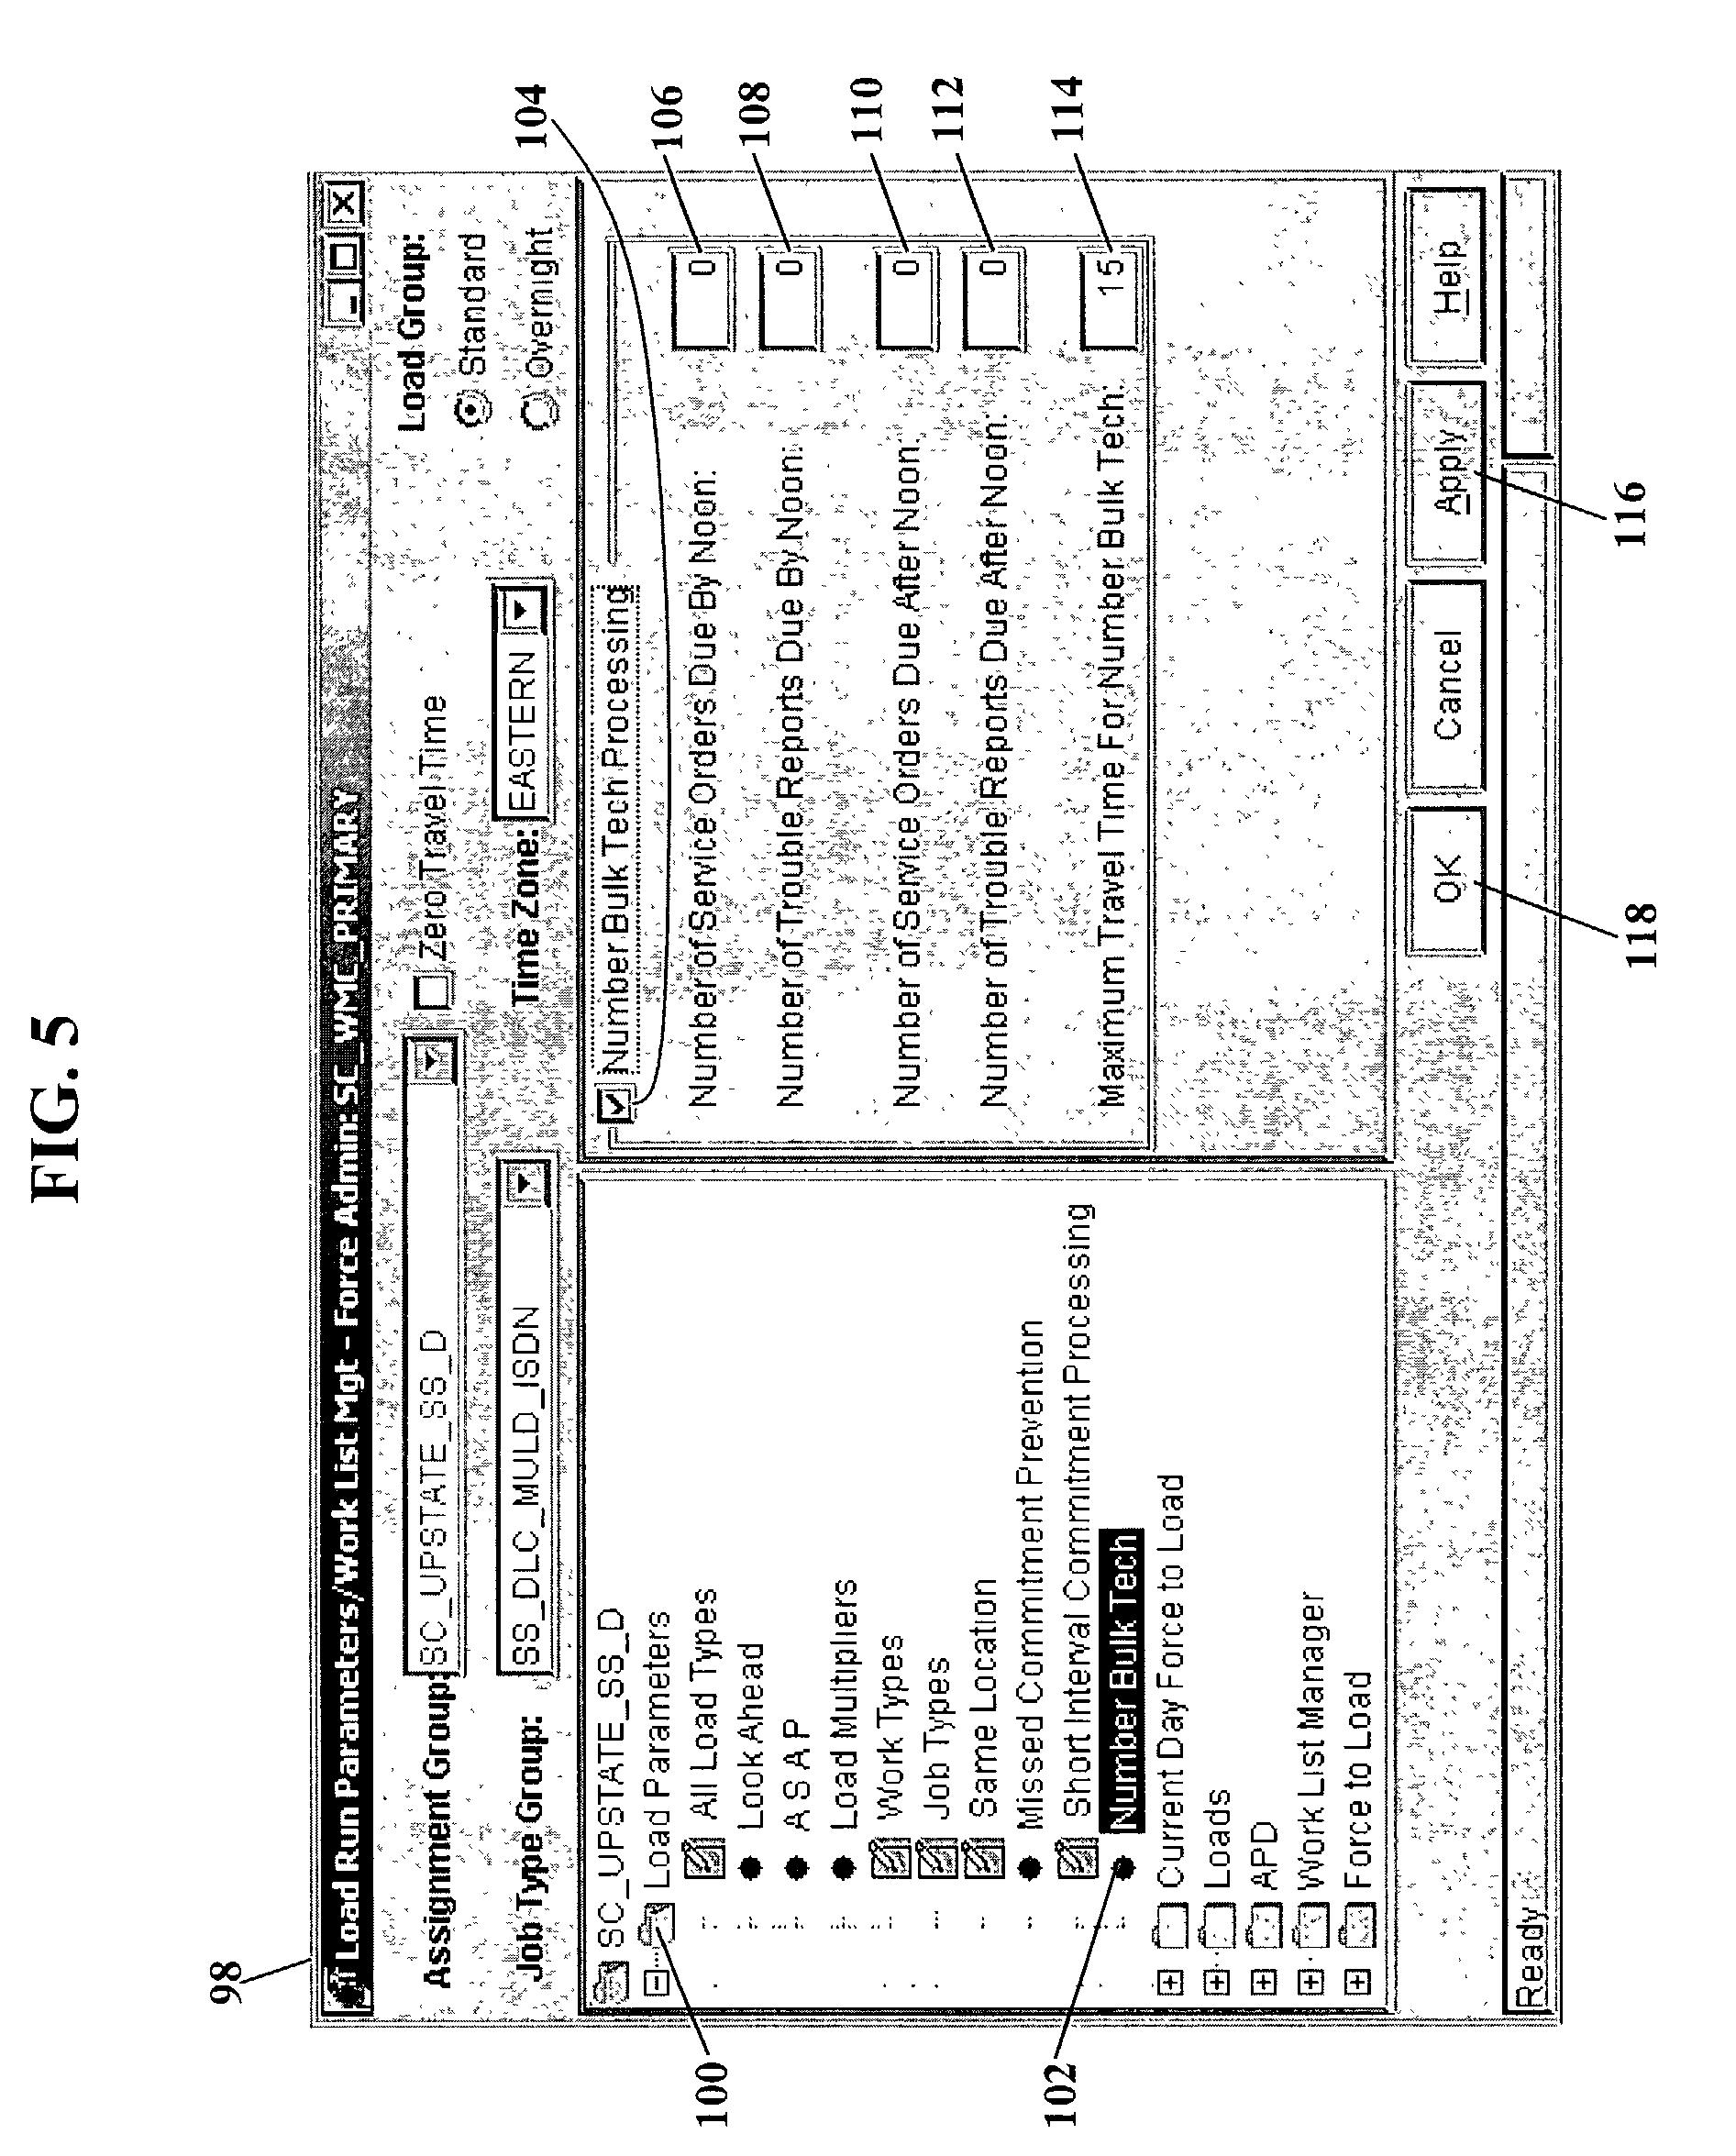 Computer Repair Technician - Wiring Diagram And Fuse Box